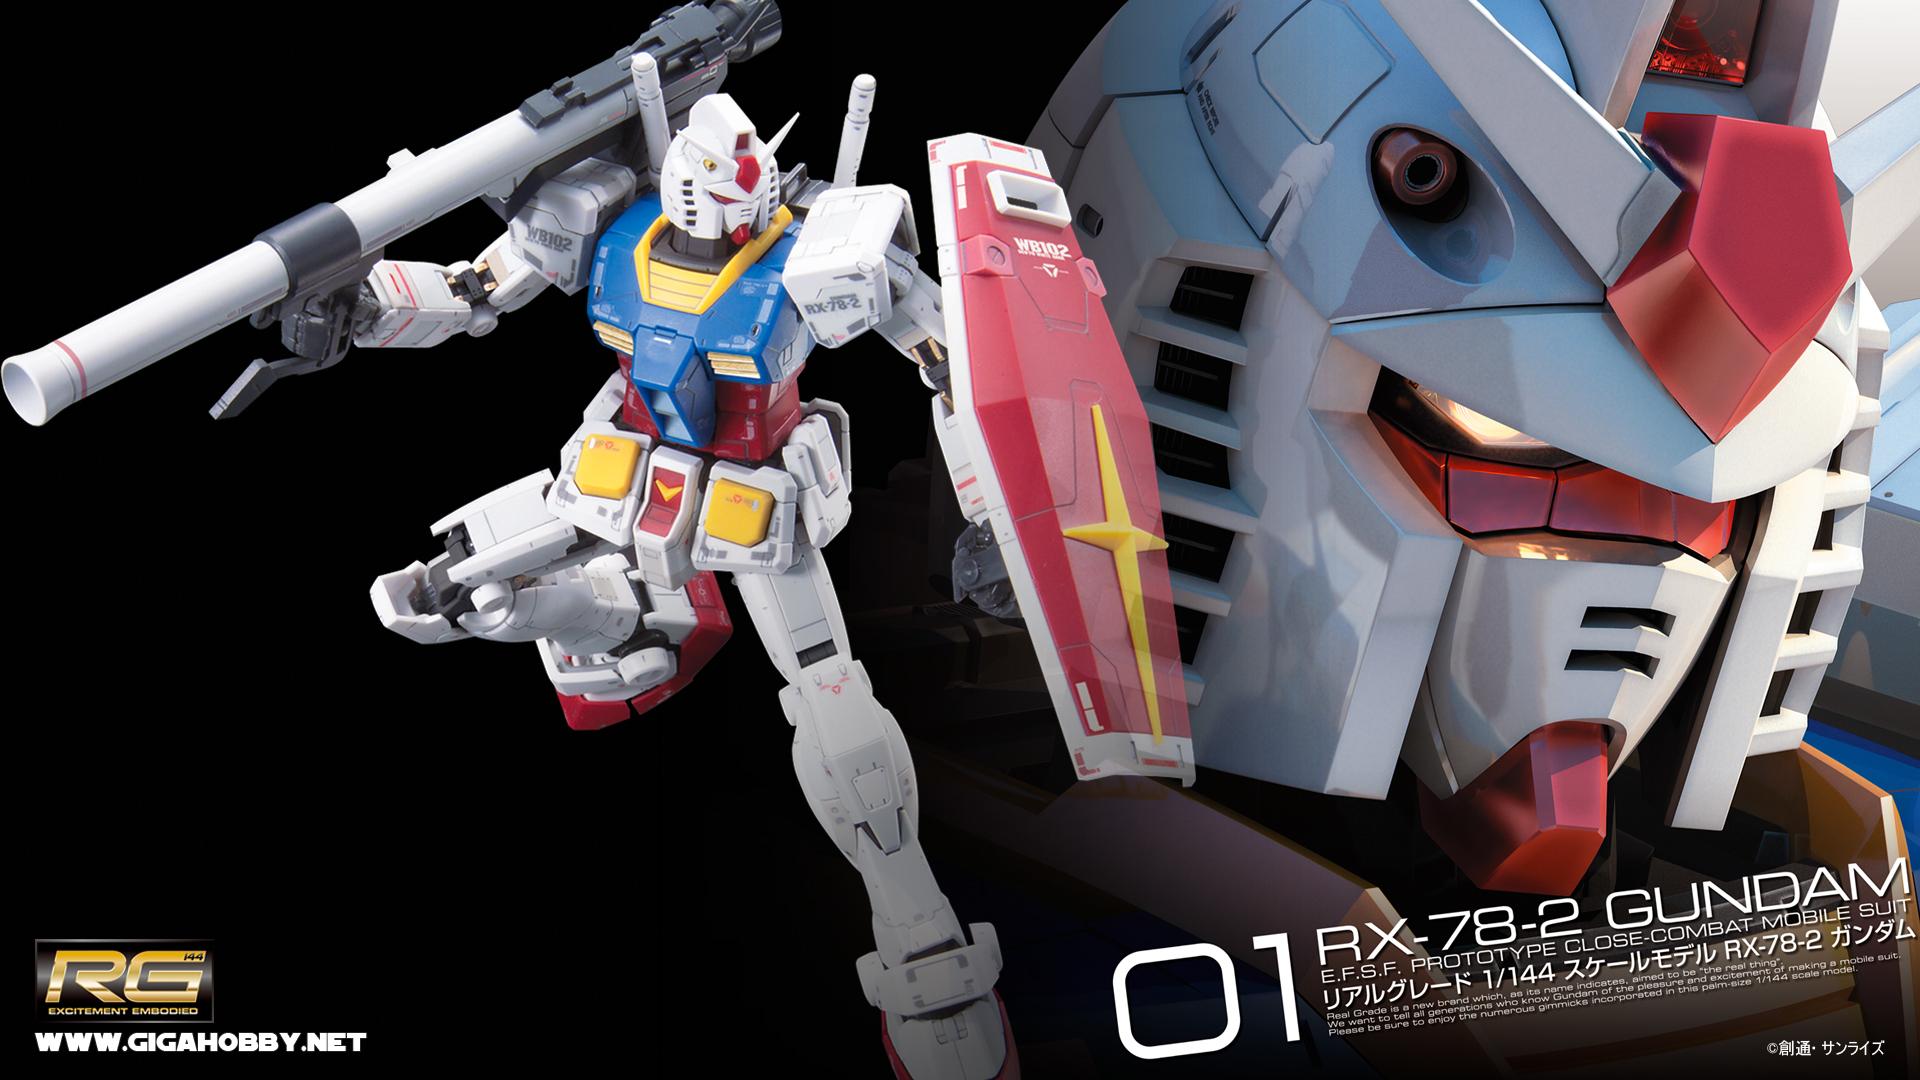 Gundam Hd Wallpaper Background Image 1920x1080 Id 226502